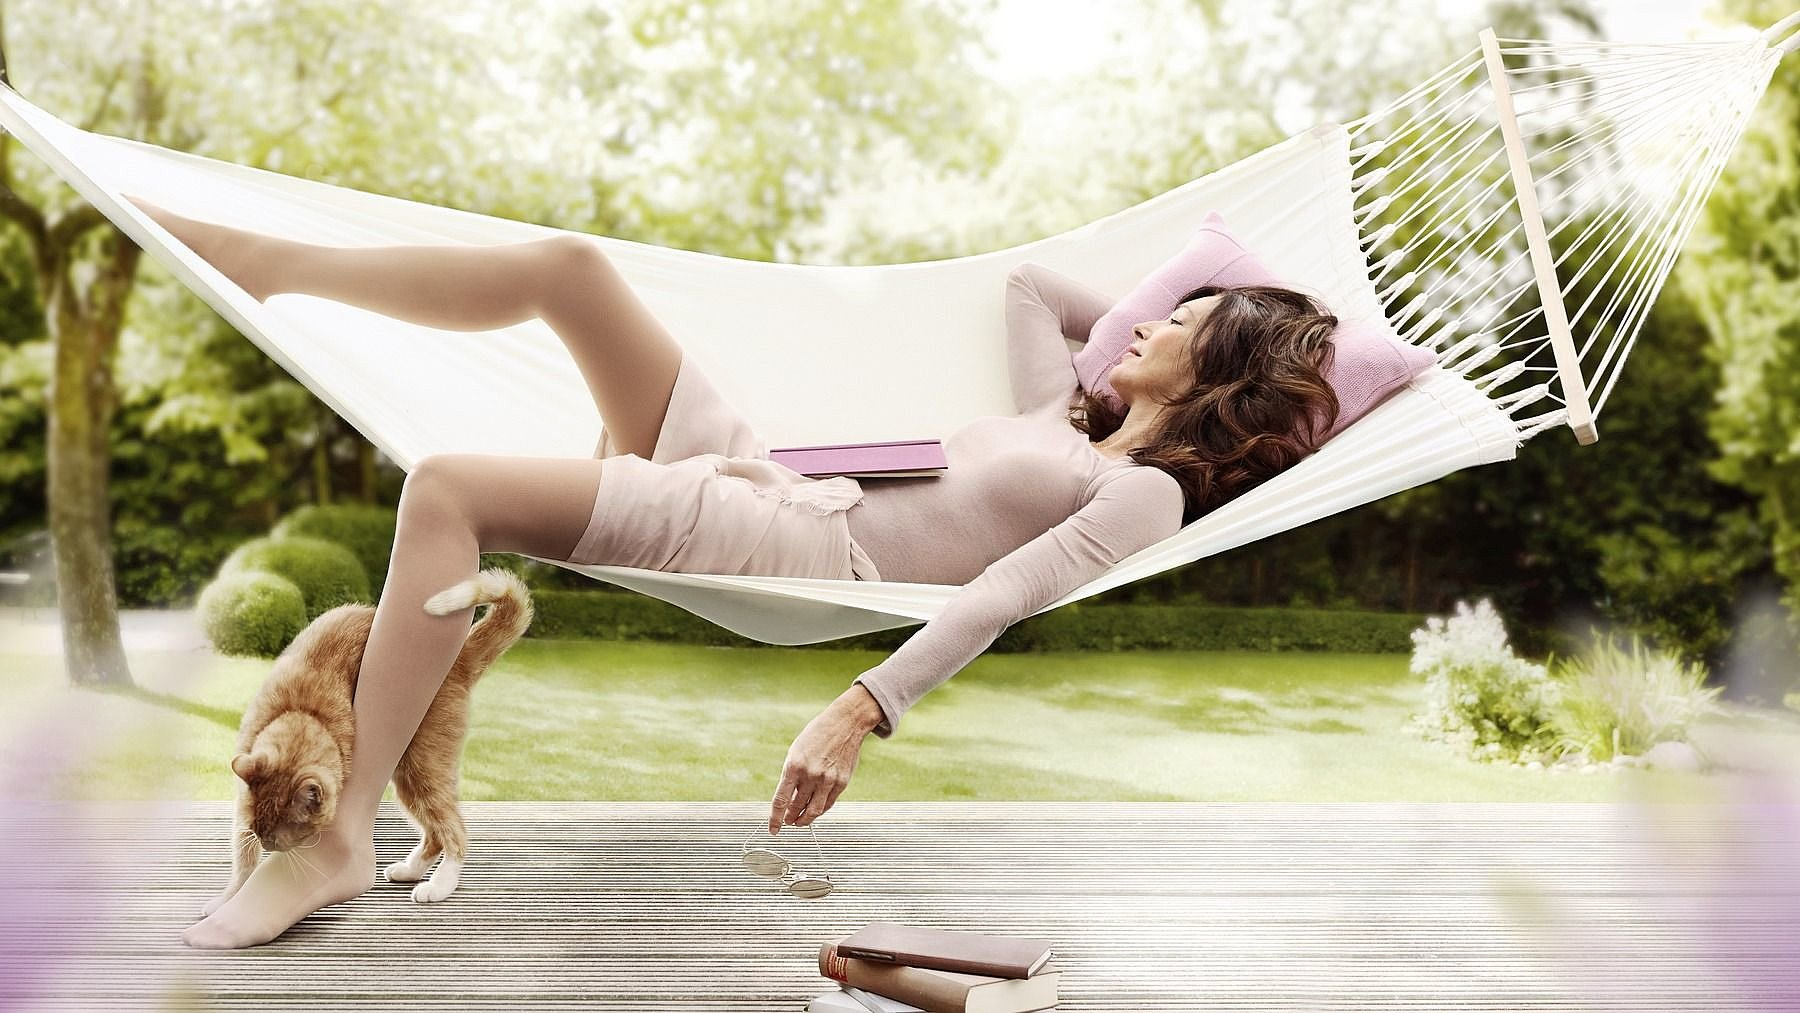 Mediven comfort compression stockings for venous disease